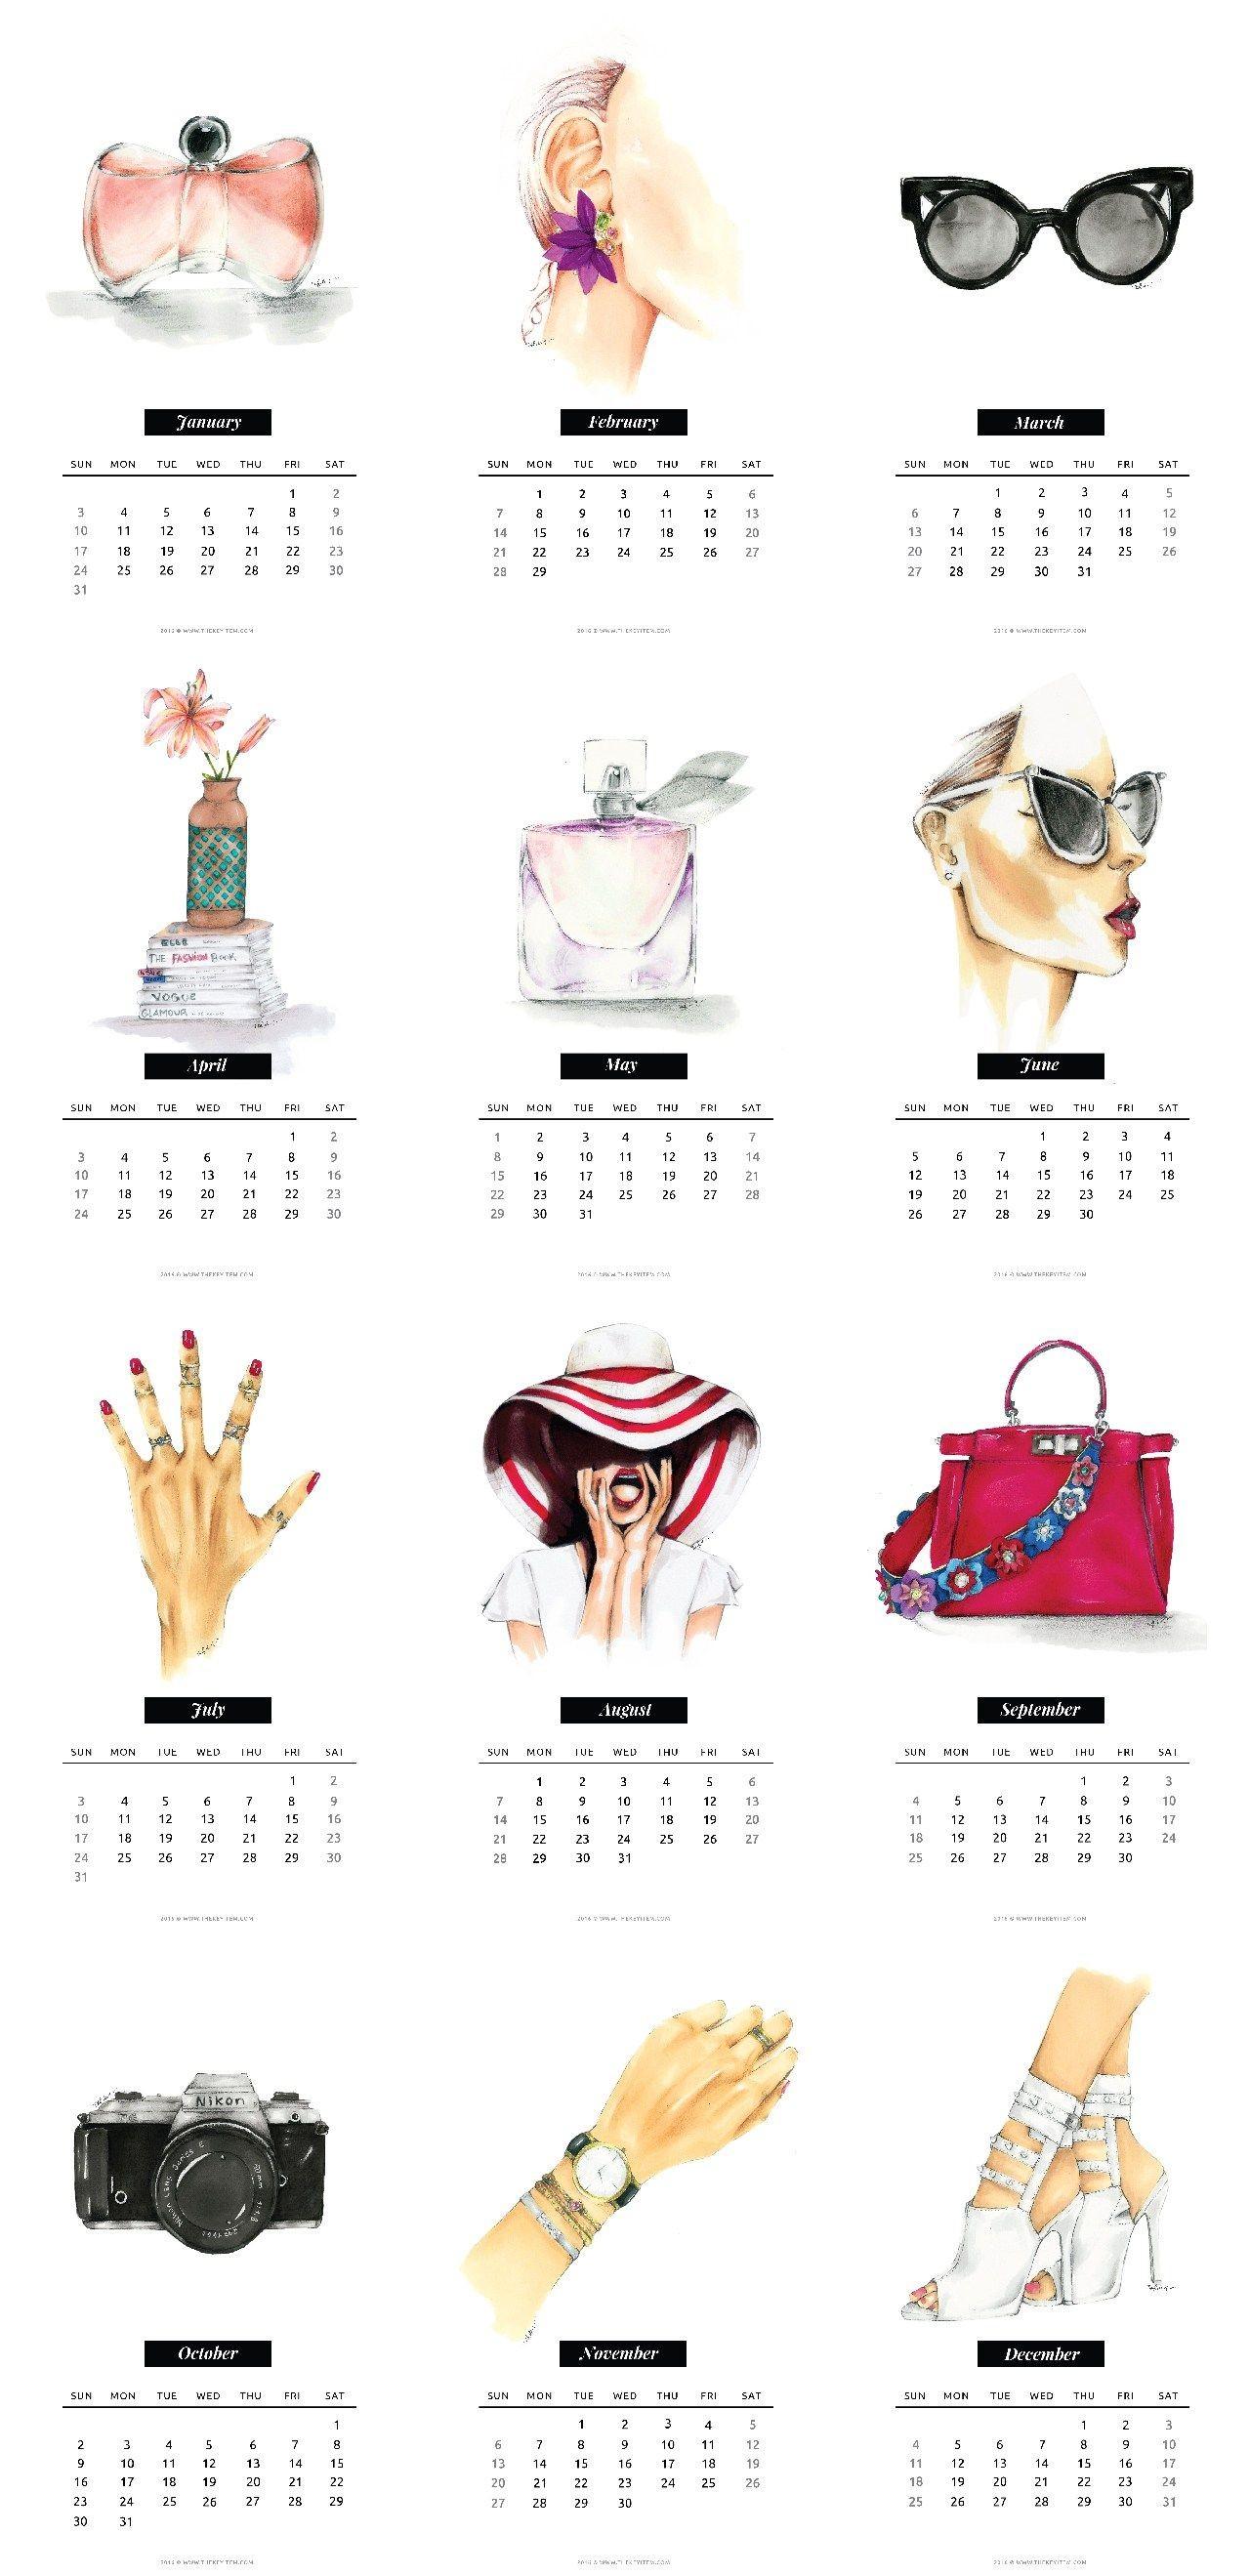 Imprimir Calendario Semestral 2017 Más Arriba-a-fecha Calendario Ilustrado 2016 Gratis Ilustraciones Of Imprimir Calendario Semestral 2017 Más Recientes Planner 2019 Panda Menino Calendario 2019 E 2020